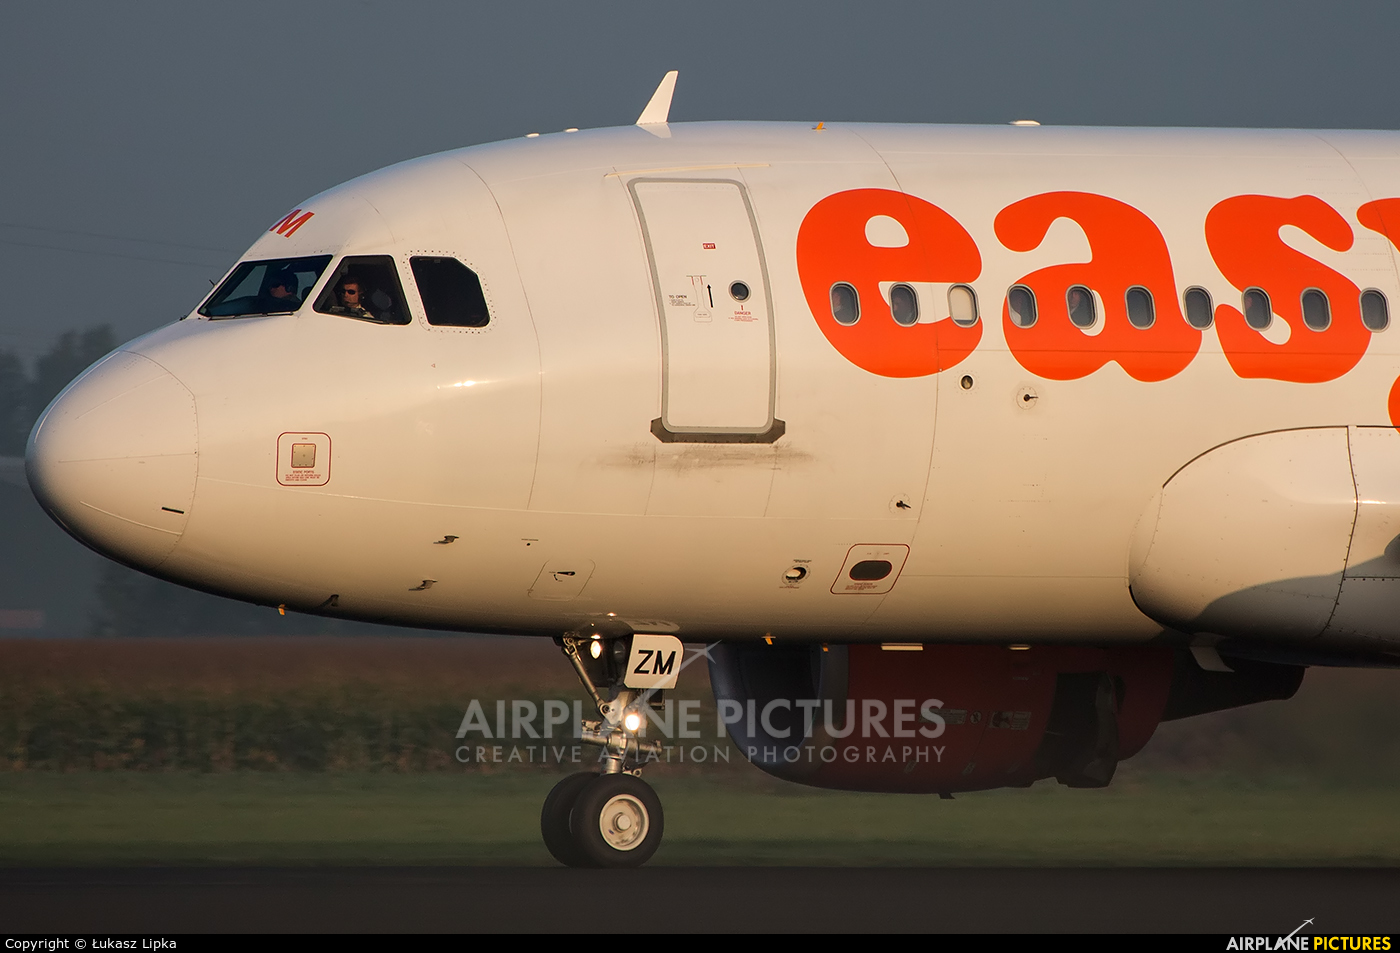 easyJet Switzerland HB-JZM aircraft at Amsterdam - Schiphol